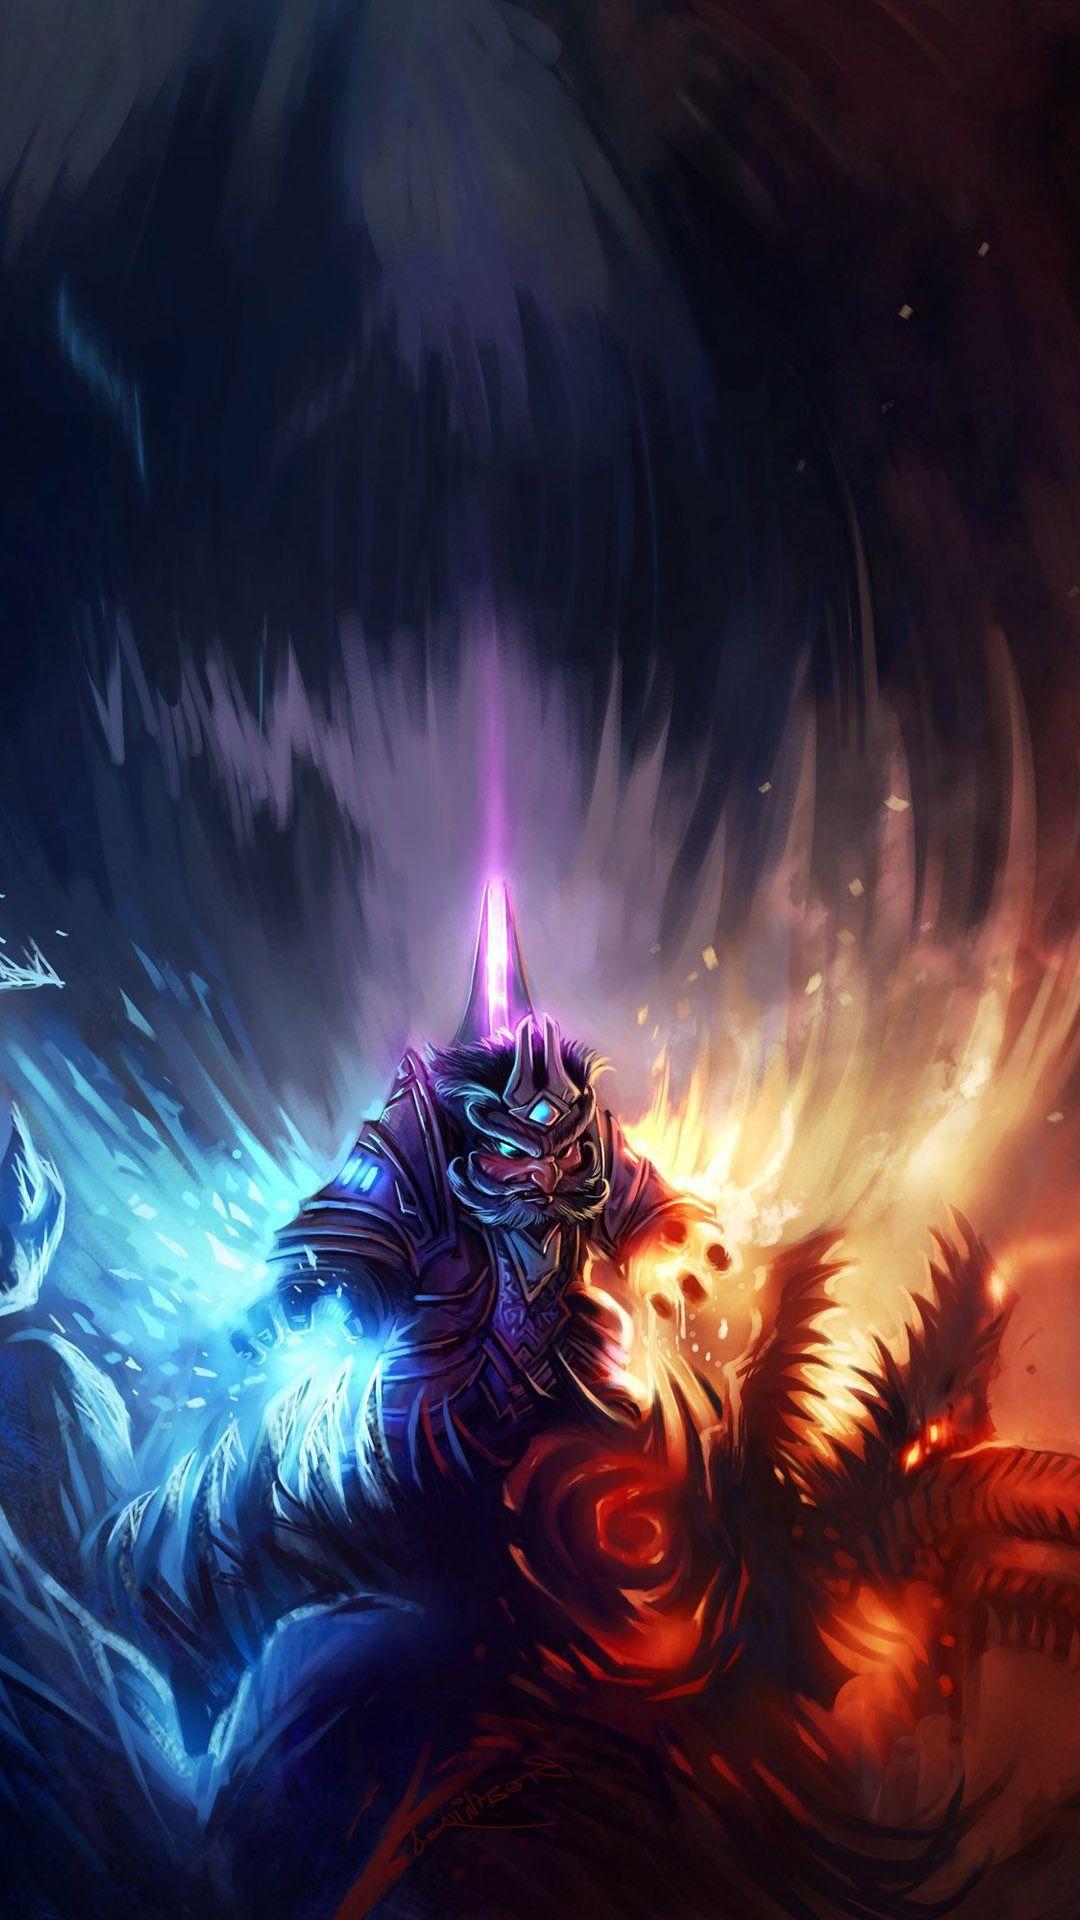 World Of Warcraft Cell Phone Wallpaper World Of Warcraft Wallpaper Warcraft Art Warcraft